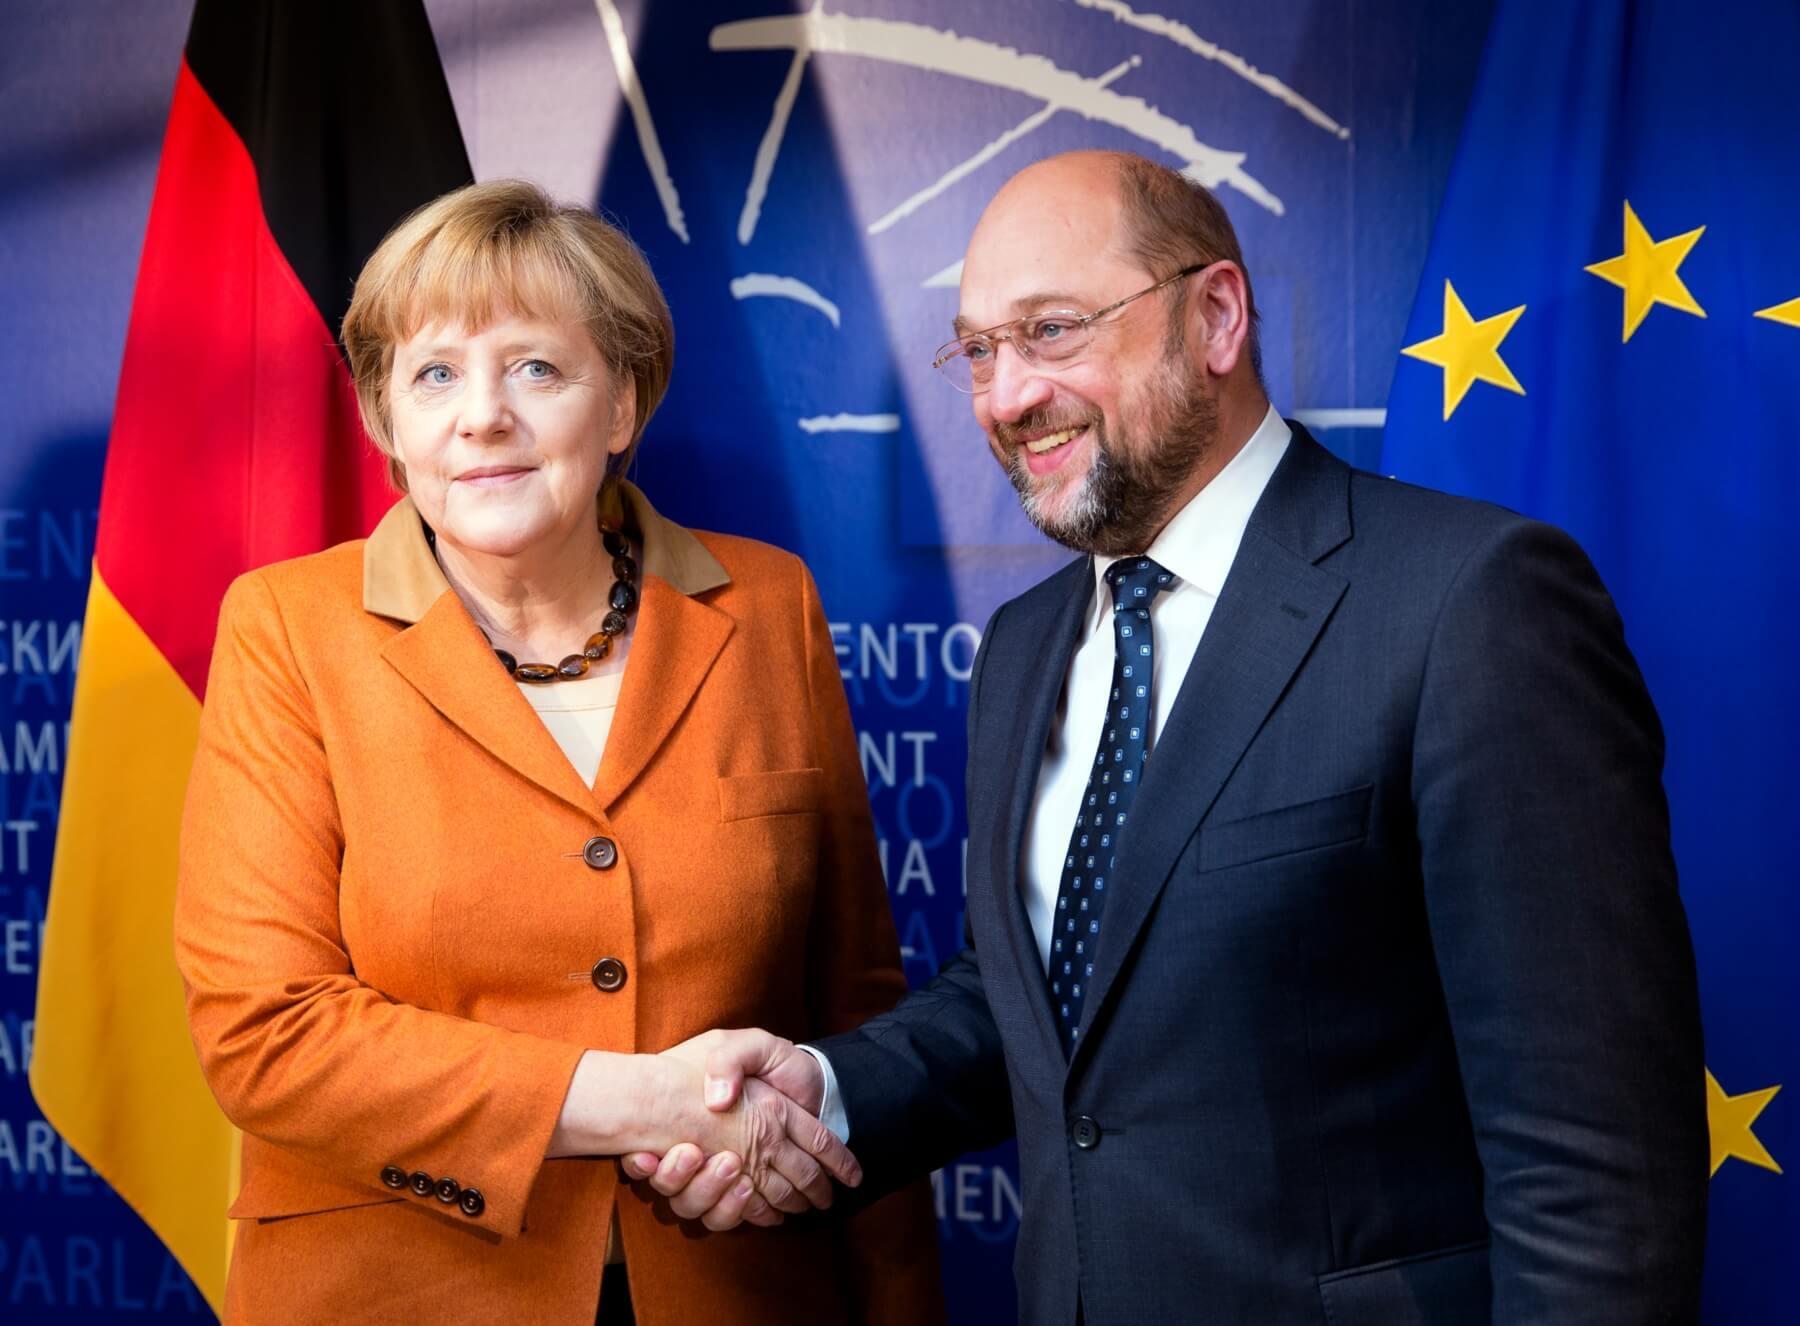 main source dpa Picture Alliance Thierry Monasse Martin Schulz chancellor Angela Merkel